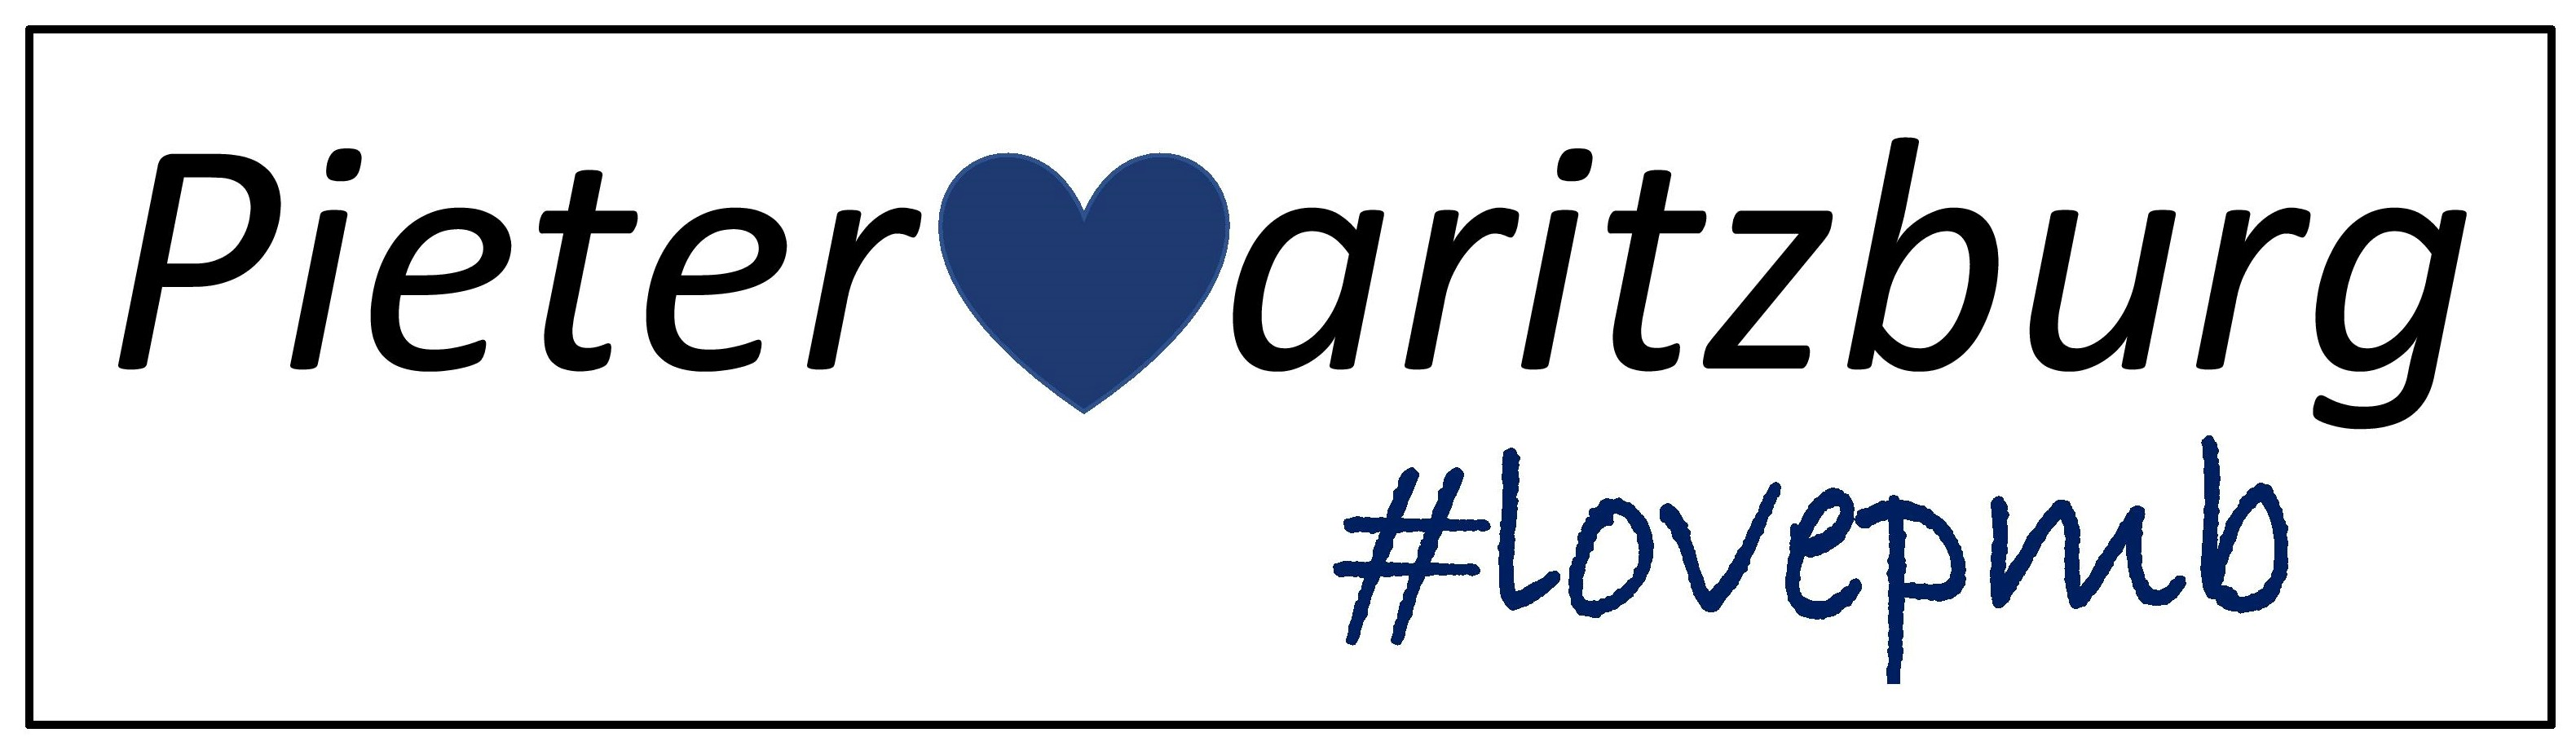 Love Pietermaritzburg - #lovepmb